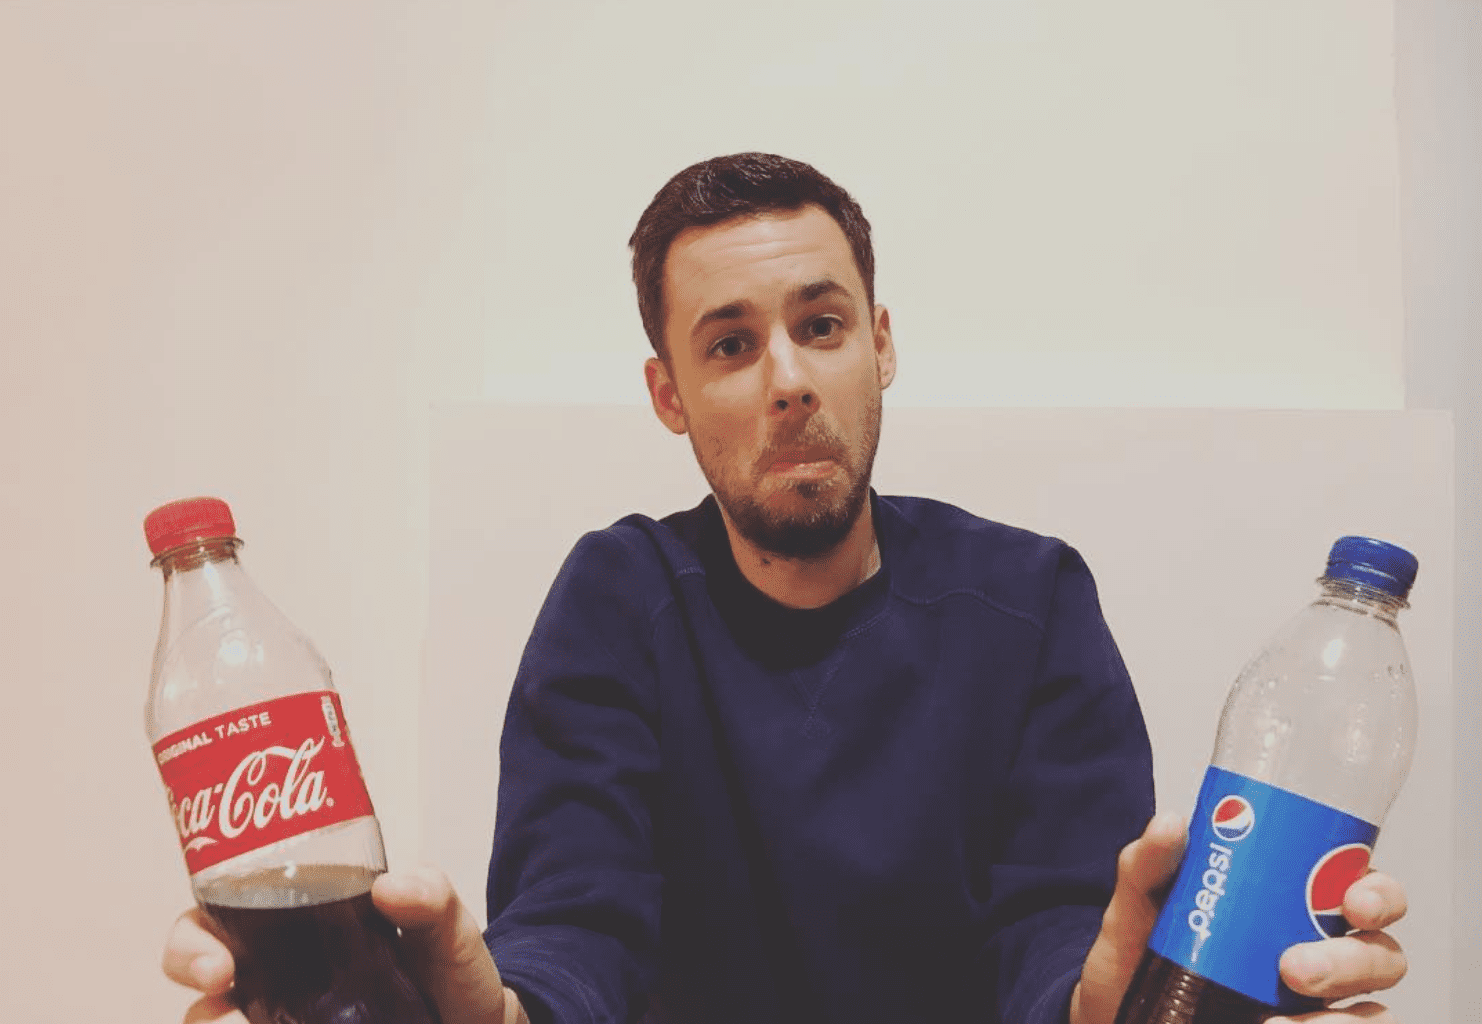 Tobias Coca Cola VS Pepsi